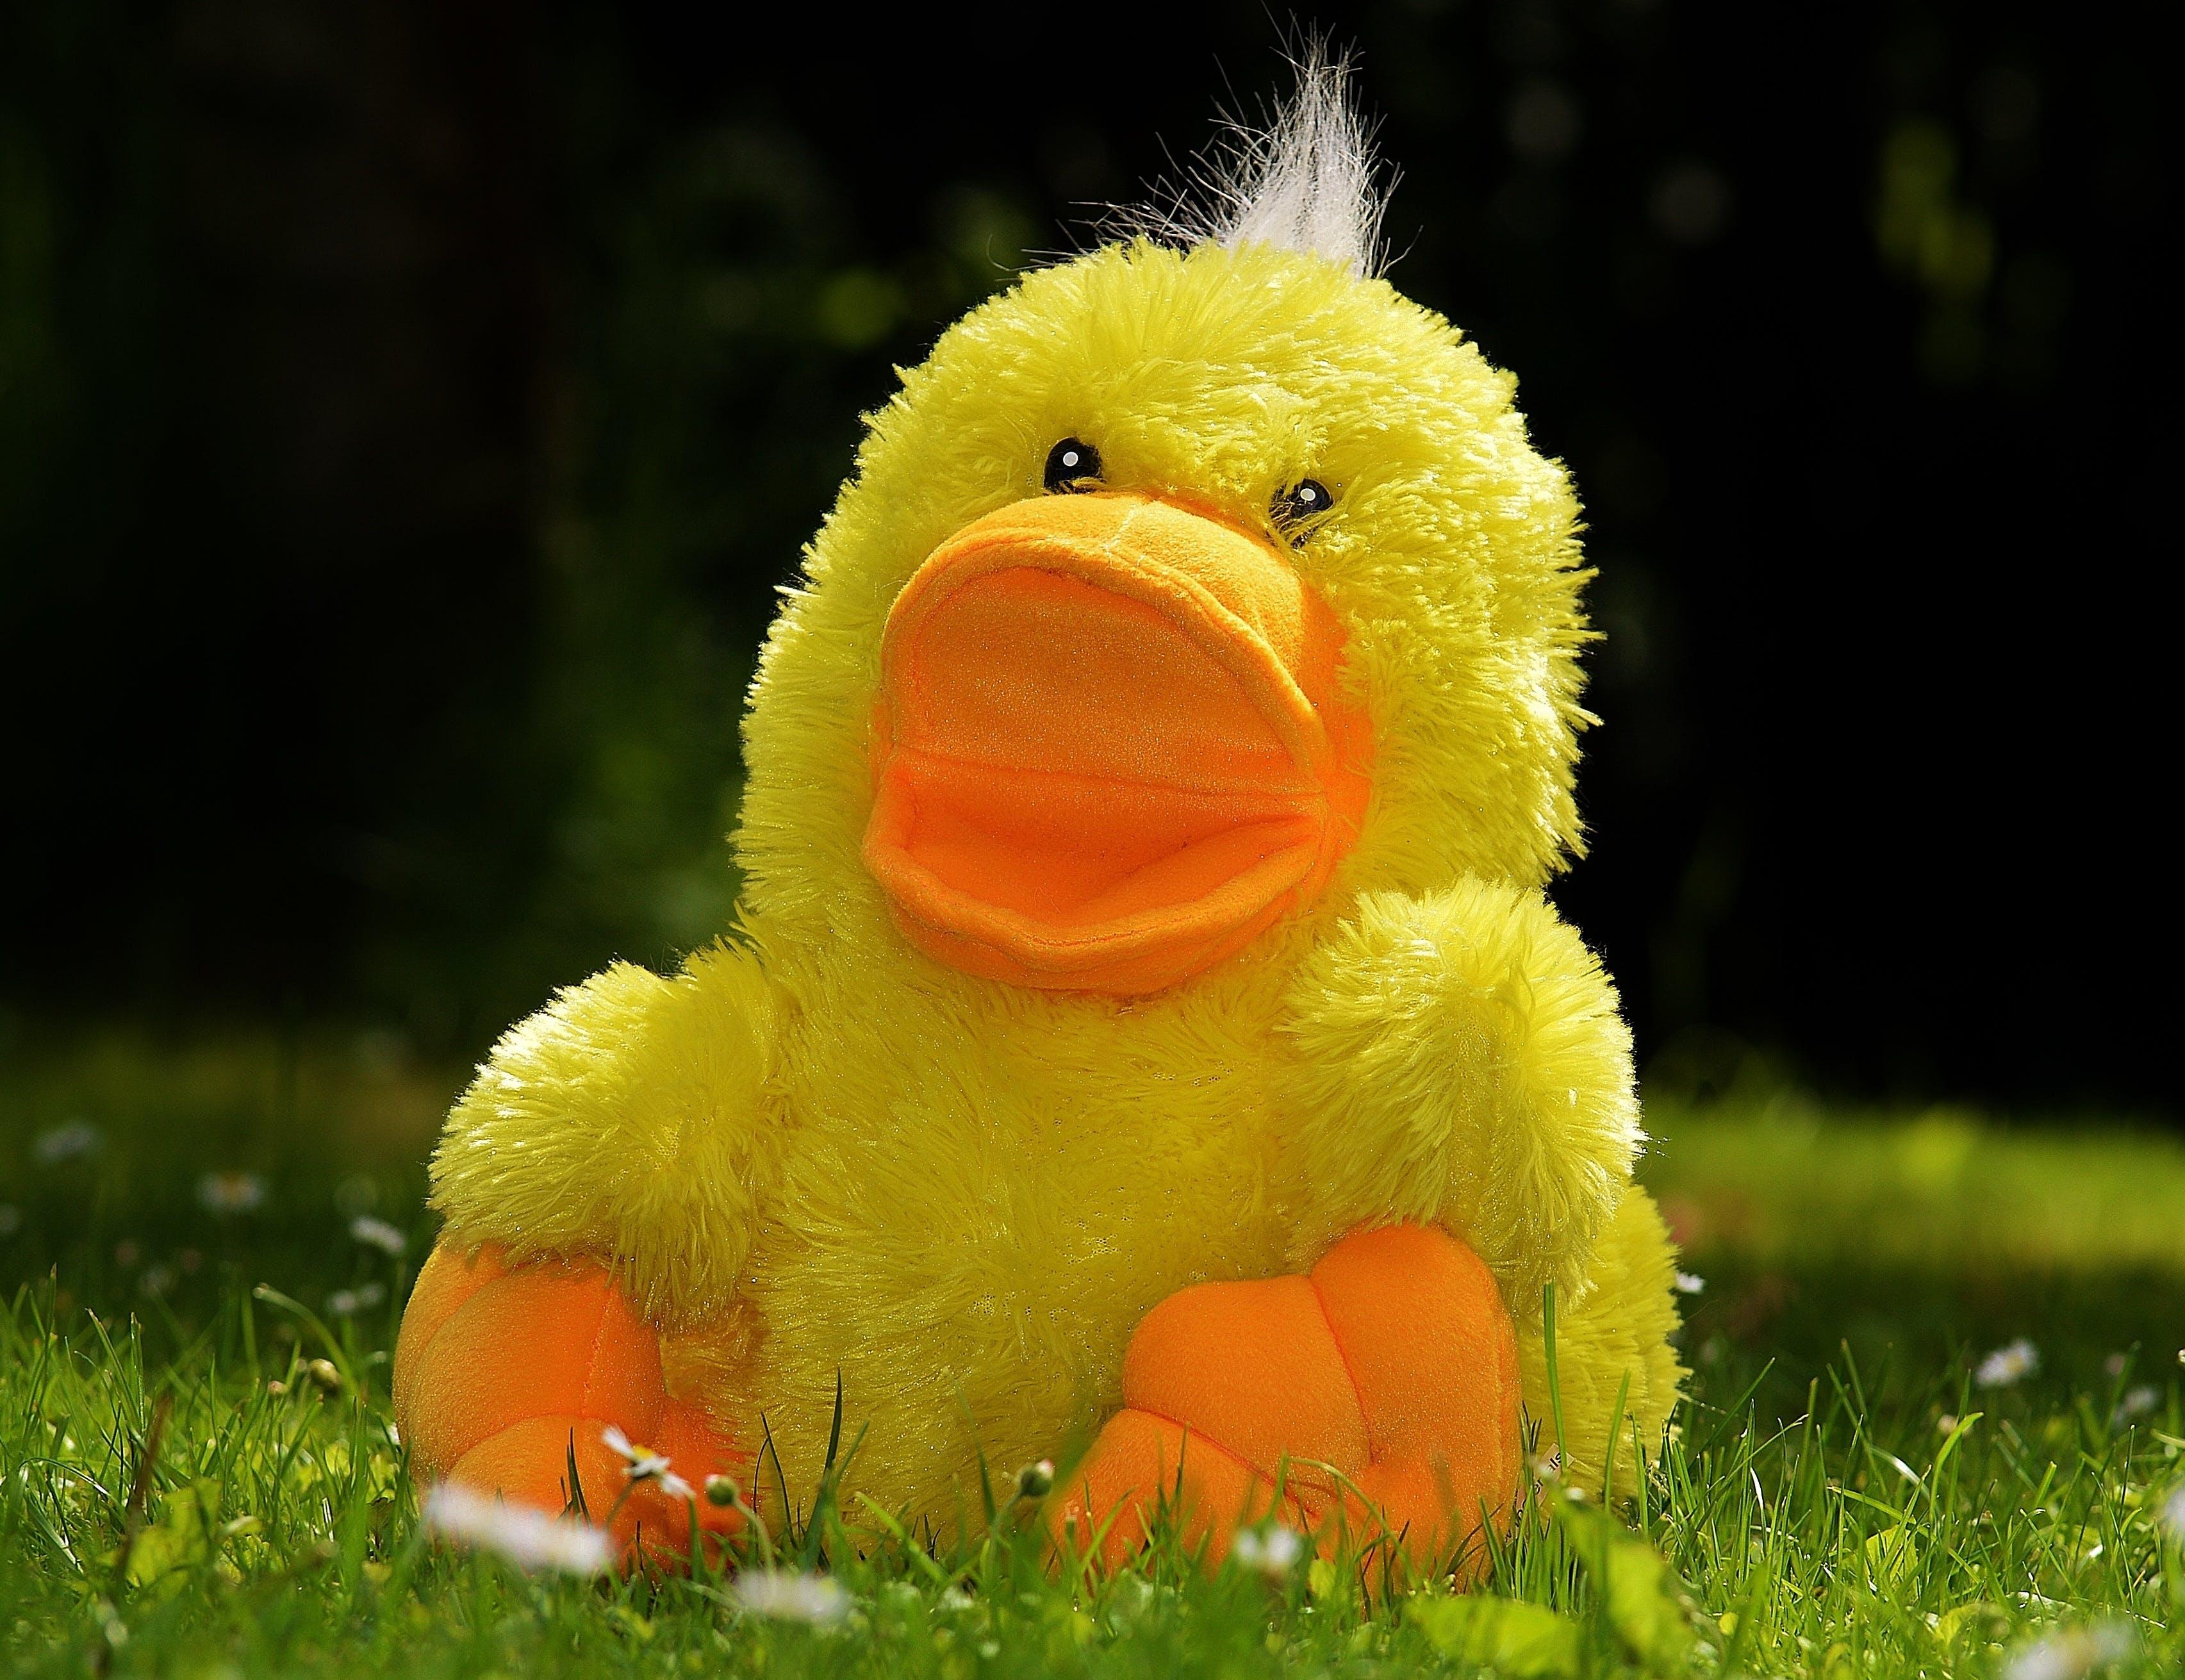 Yellow Plush Duck Toy